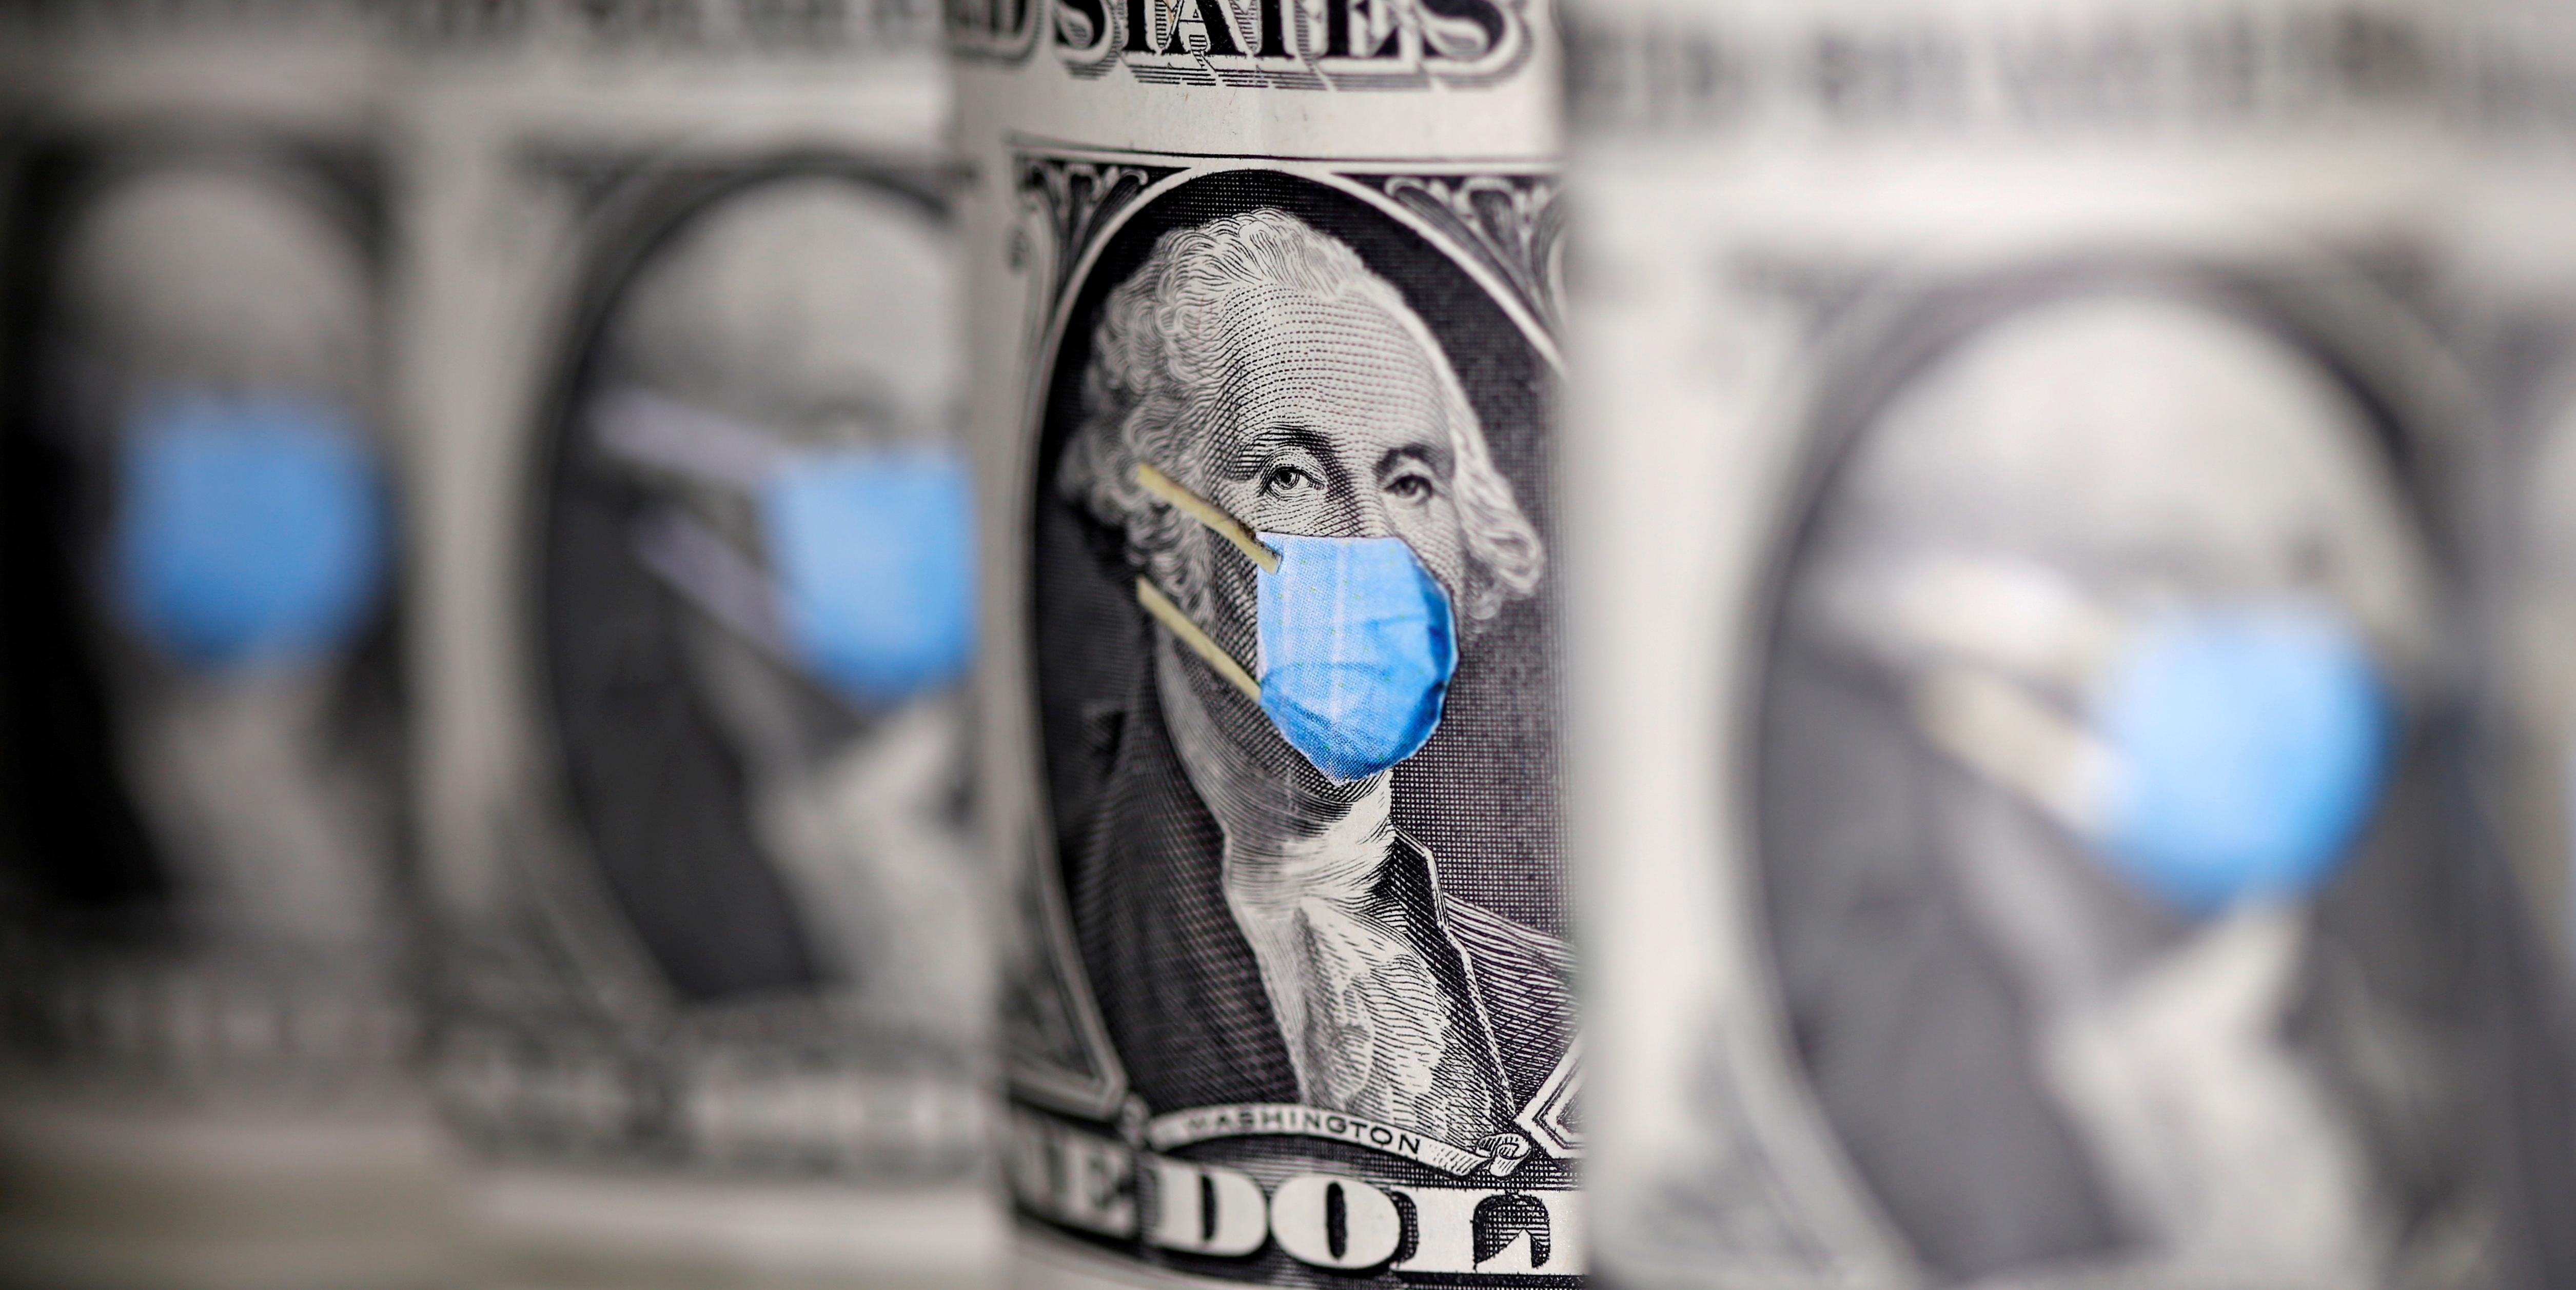 illustration-coronavirus-billet-de-1-dollar-sur-lequel-george-washington-est-represente-avec-un-masque